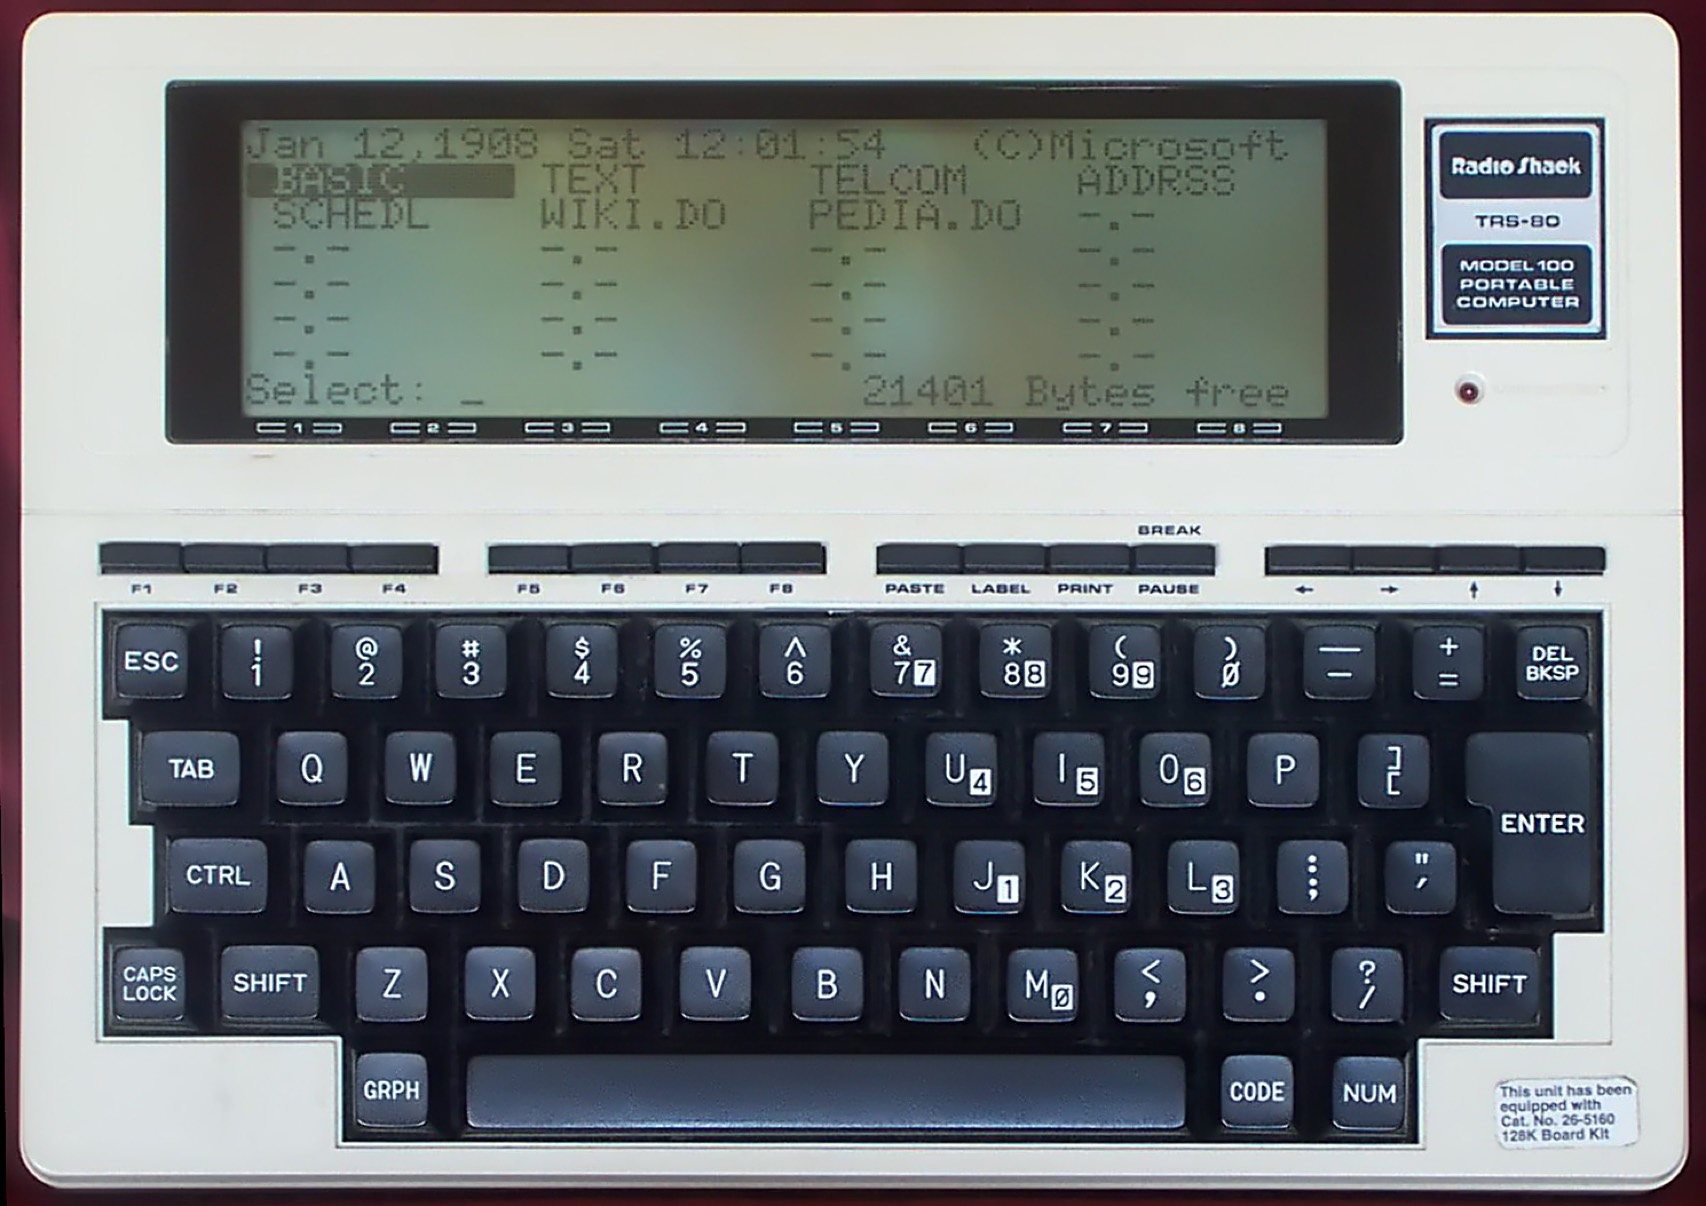 Radio Shack Trs-80 Model 100